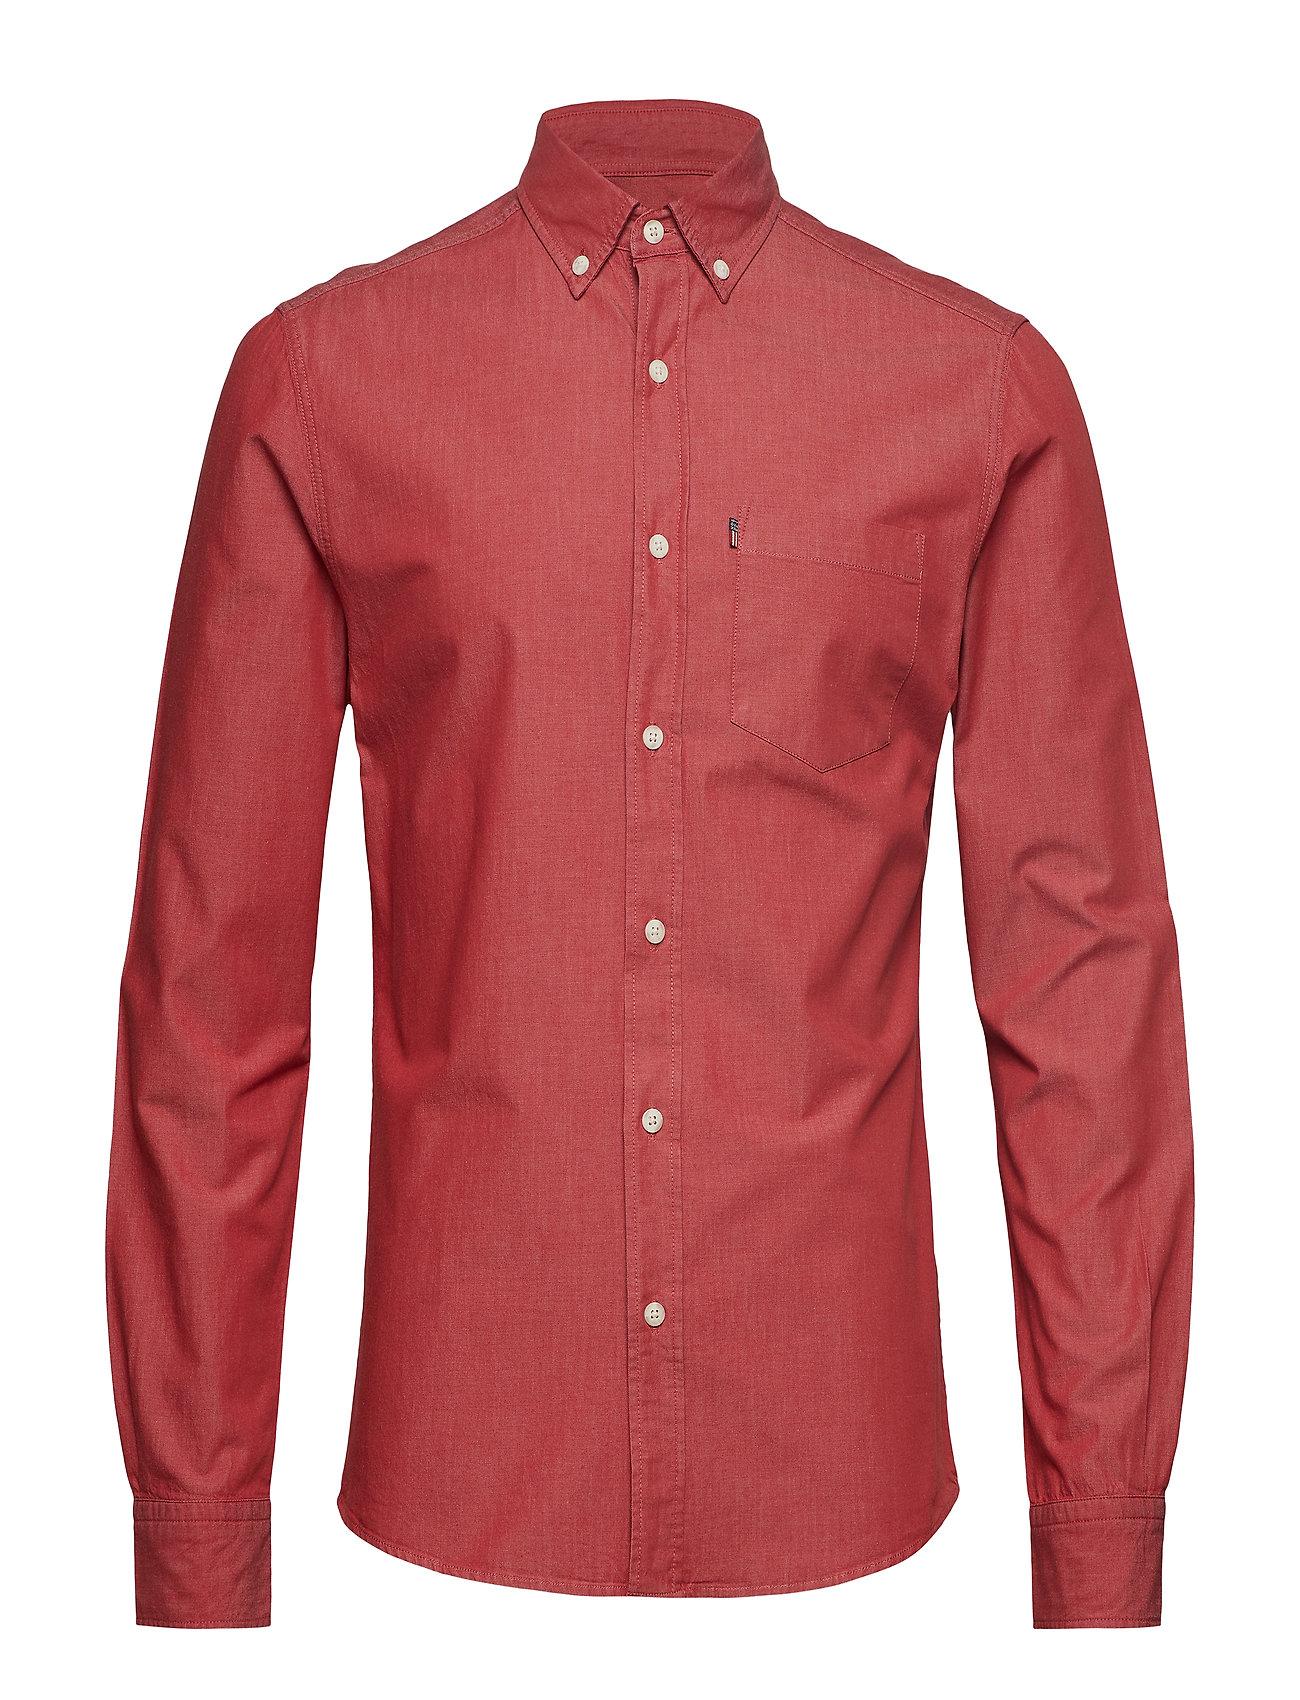 Lexington Clothing Clive Denim Shirt - RED